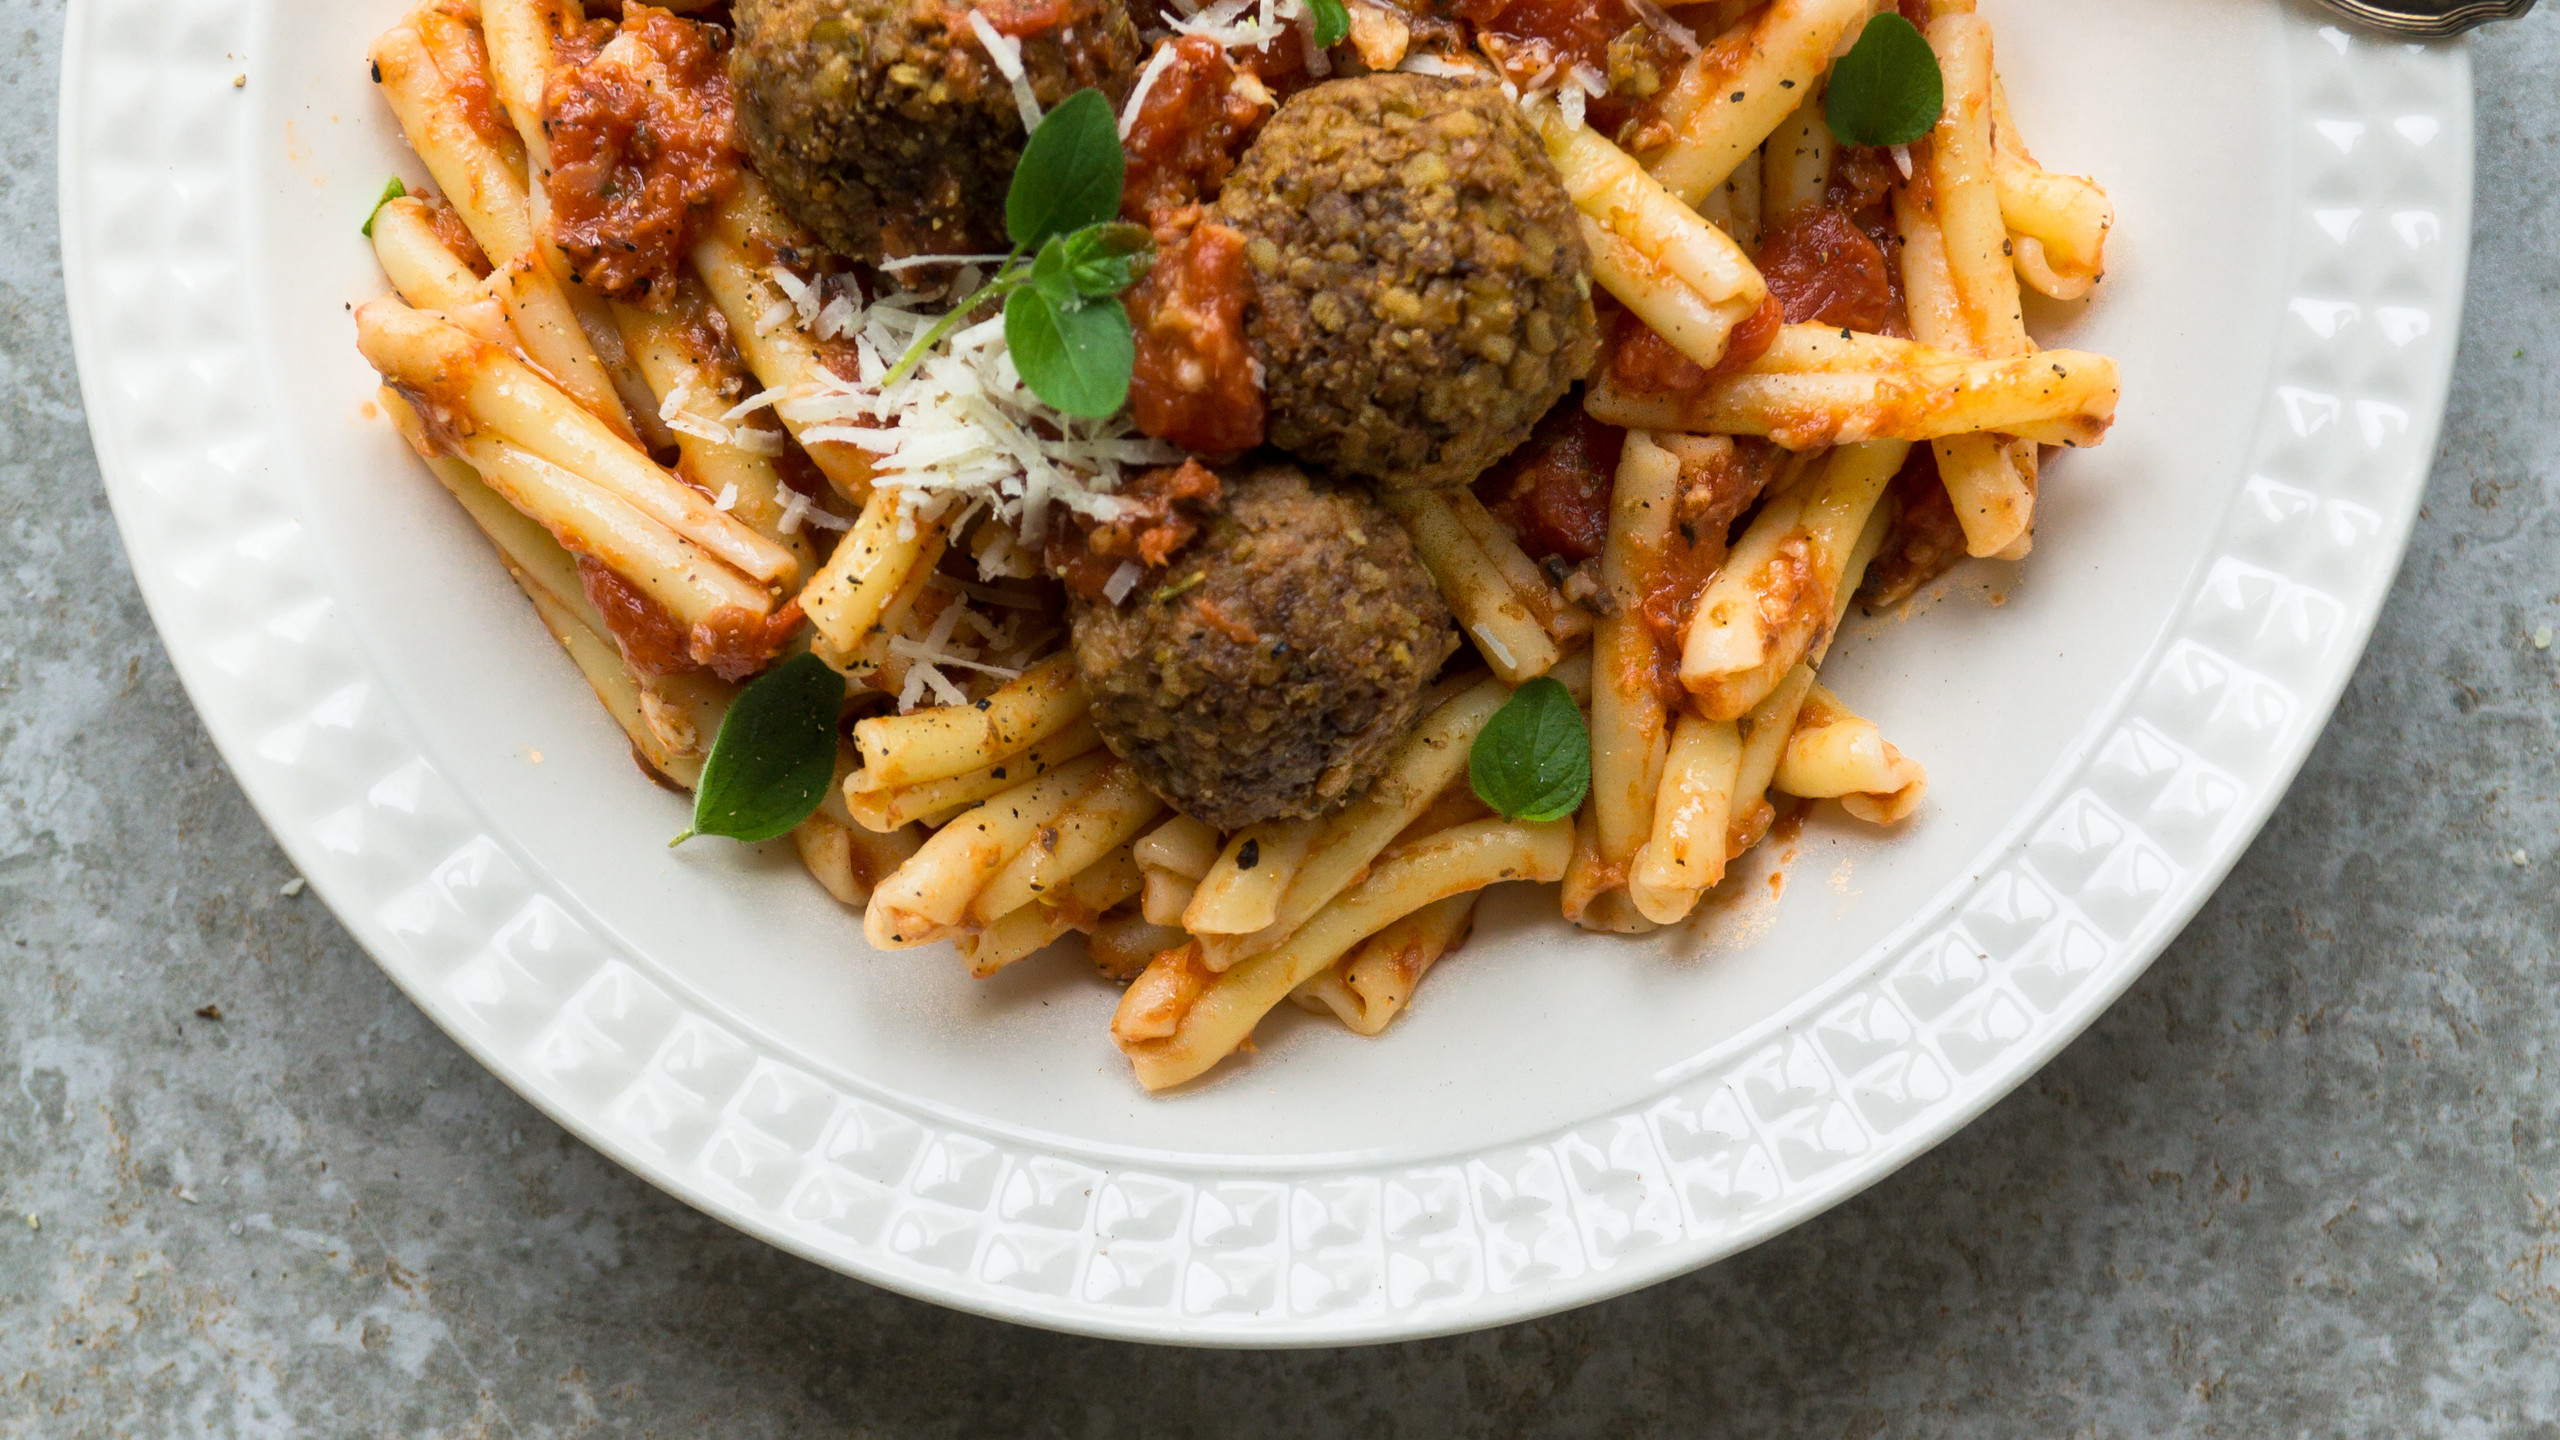 Spaghetti Meatsessballs